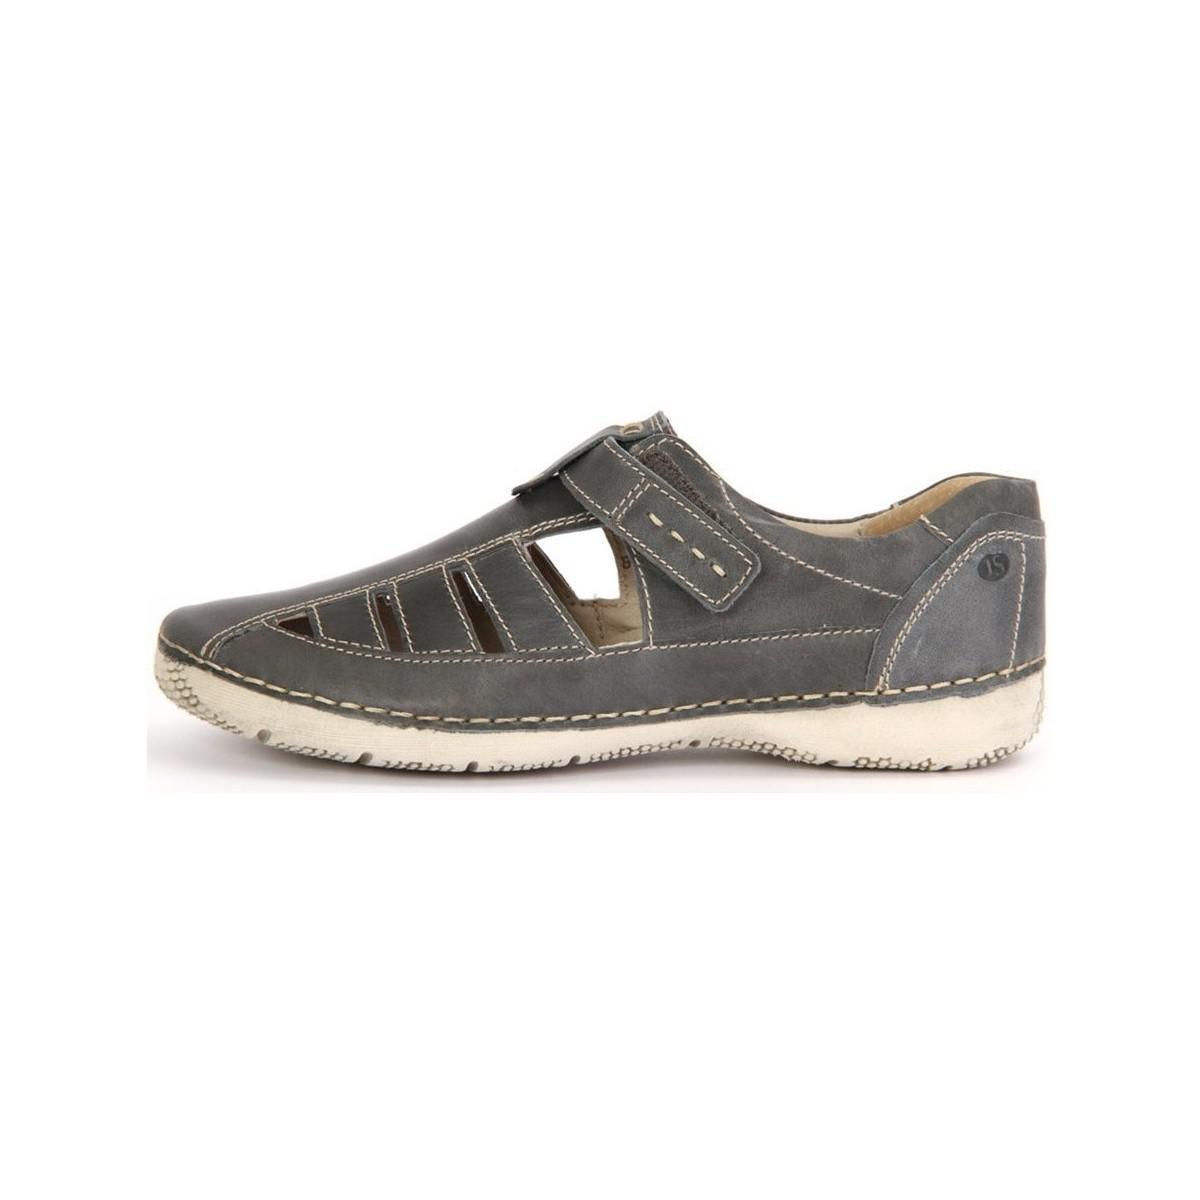 Josef Seibel Denim Antje 11 82911 62 540 Jeans Leder Women's Shoes (trainers) In Multicolour